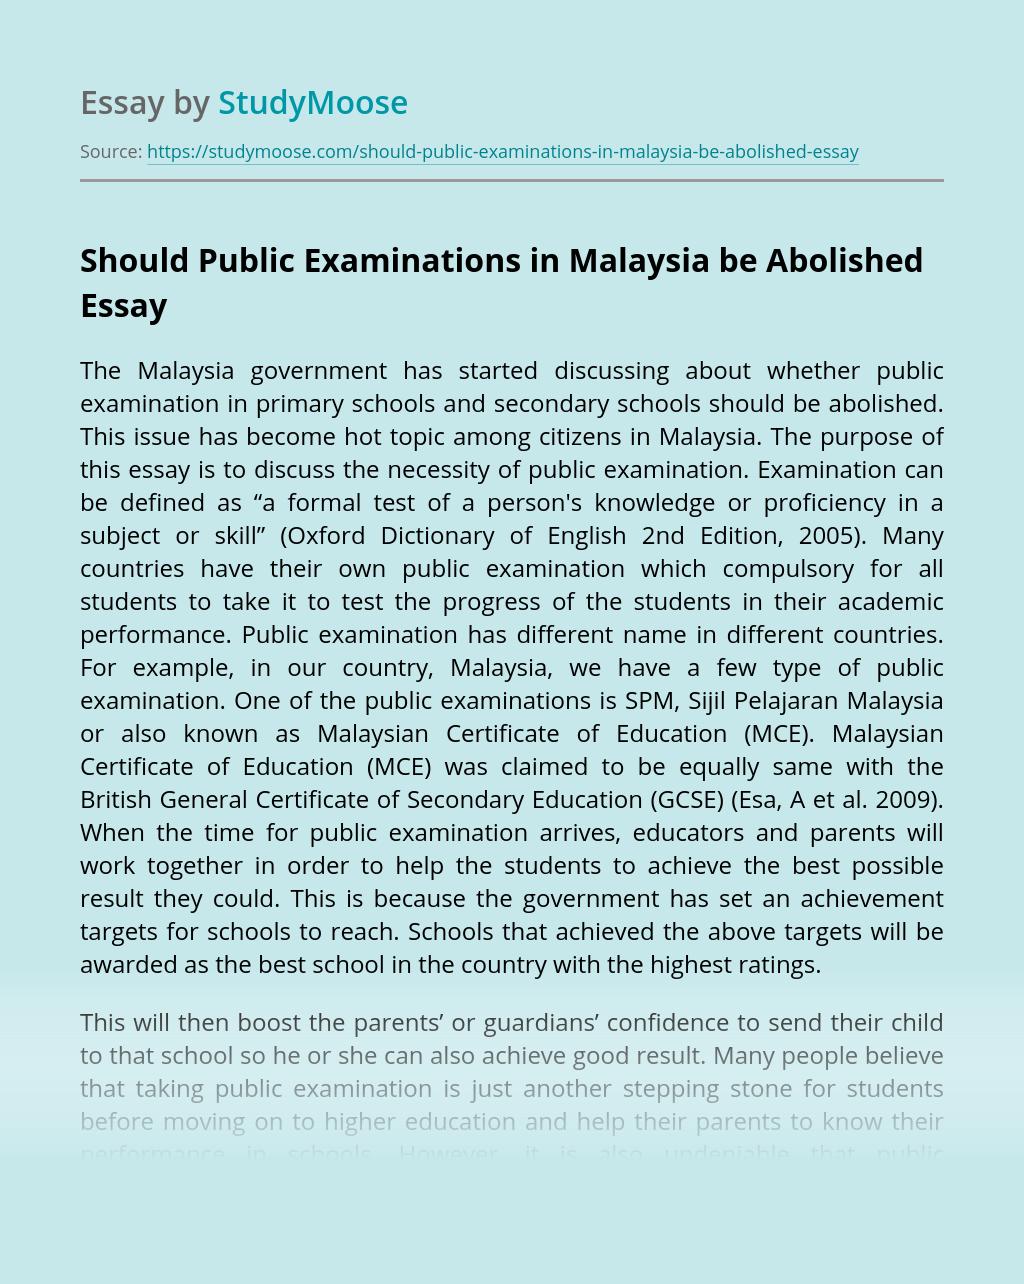 Should Public Examinations in Malaysia be Abolished